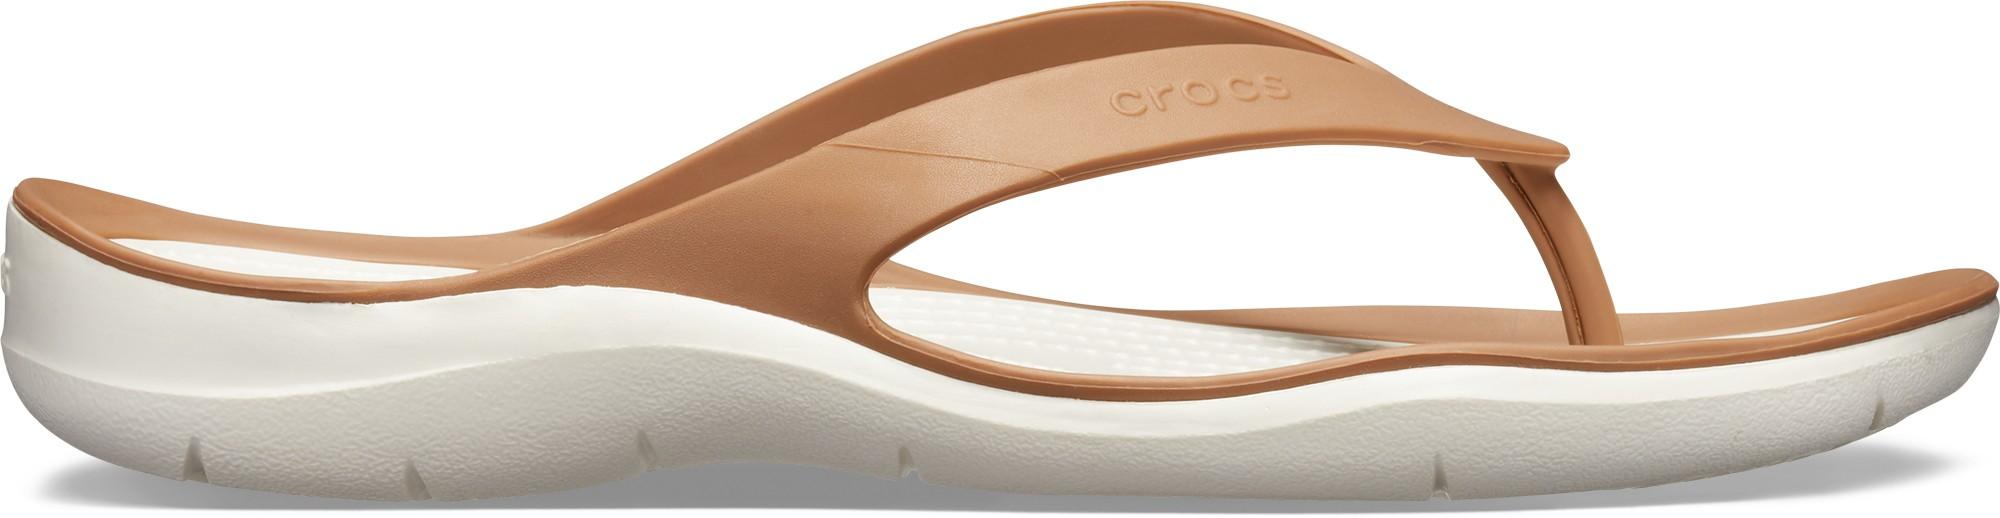 Crocs™ Women's Swiftwater Flip Bronze/Oyster 41